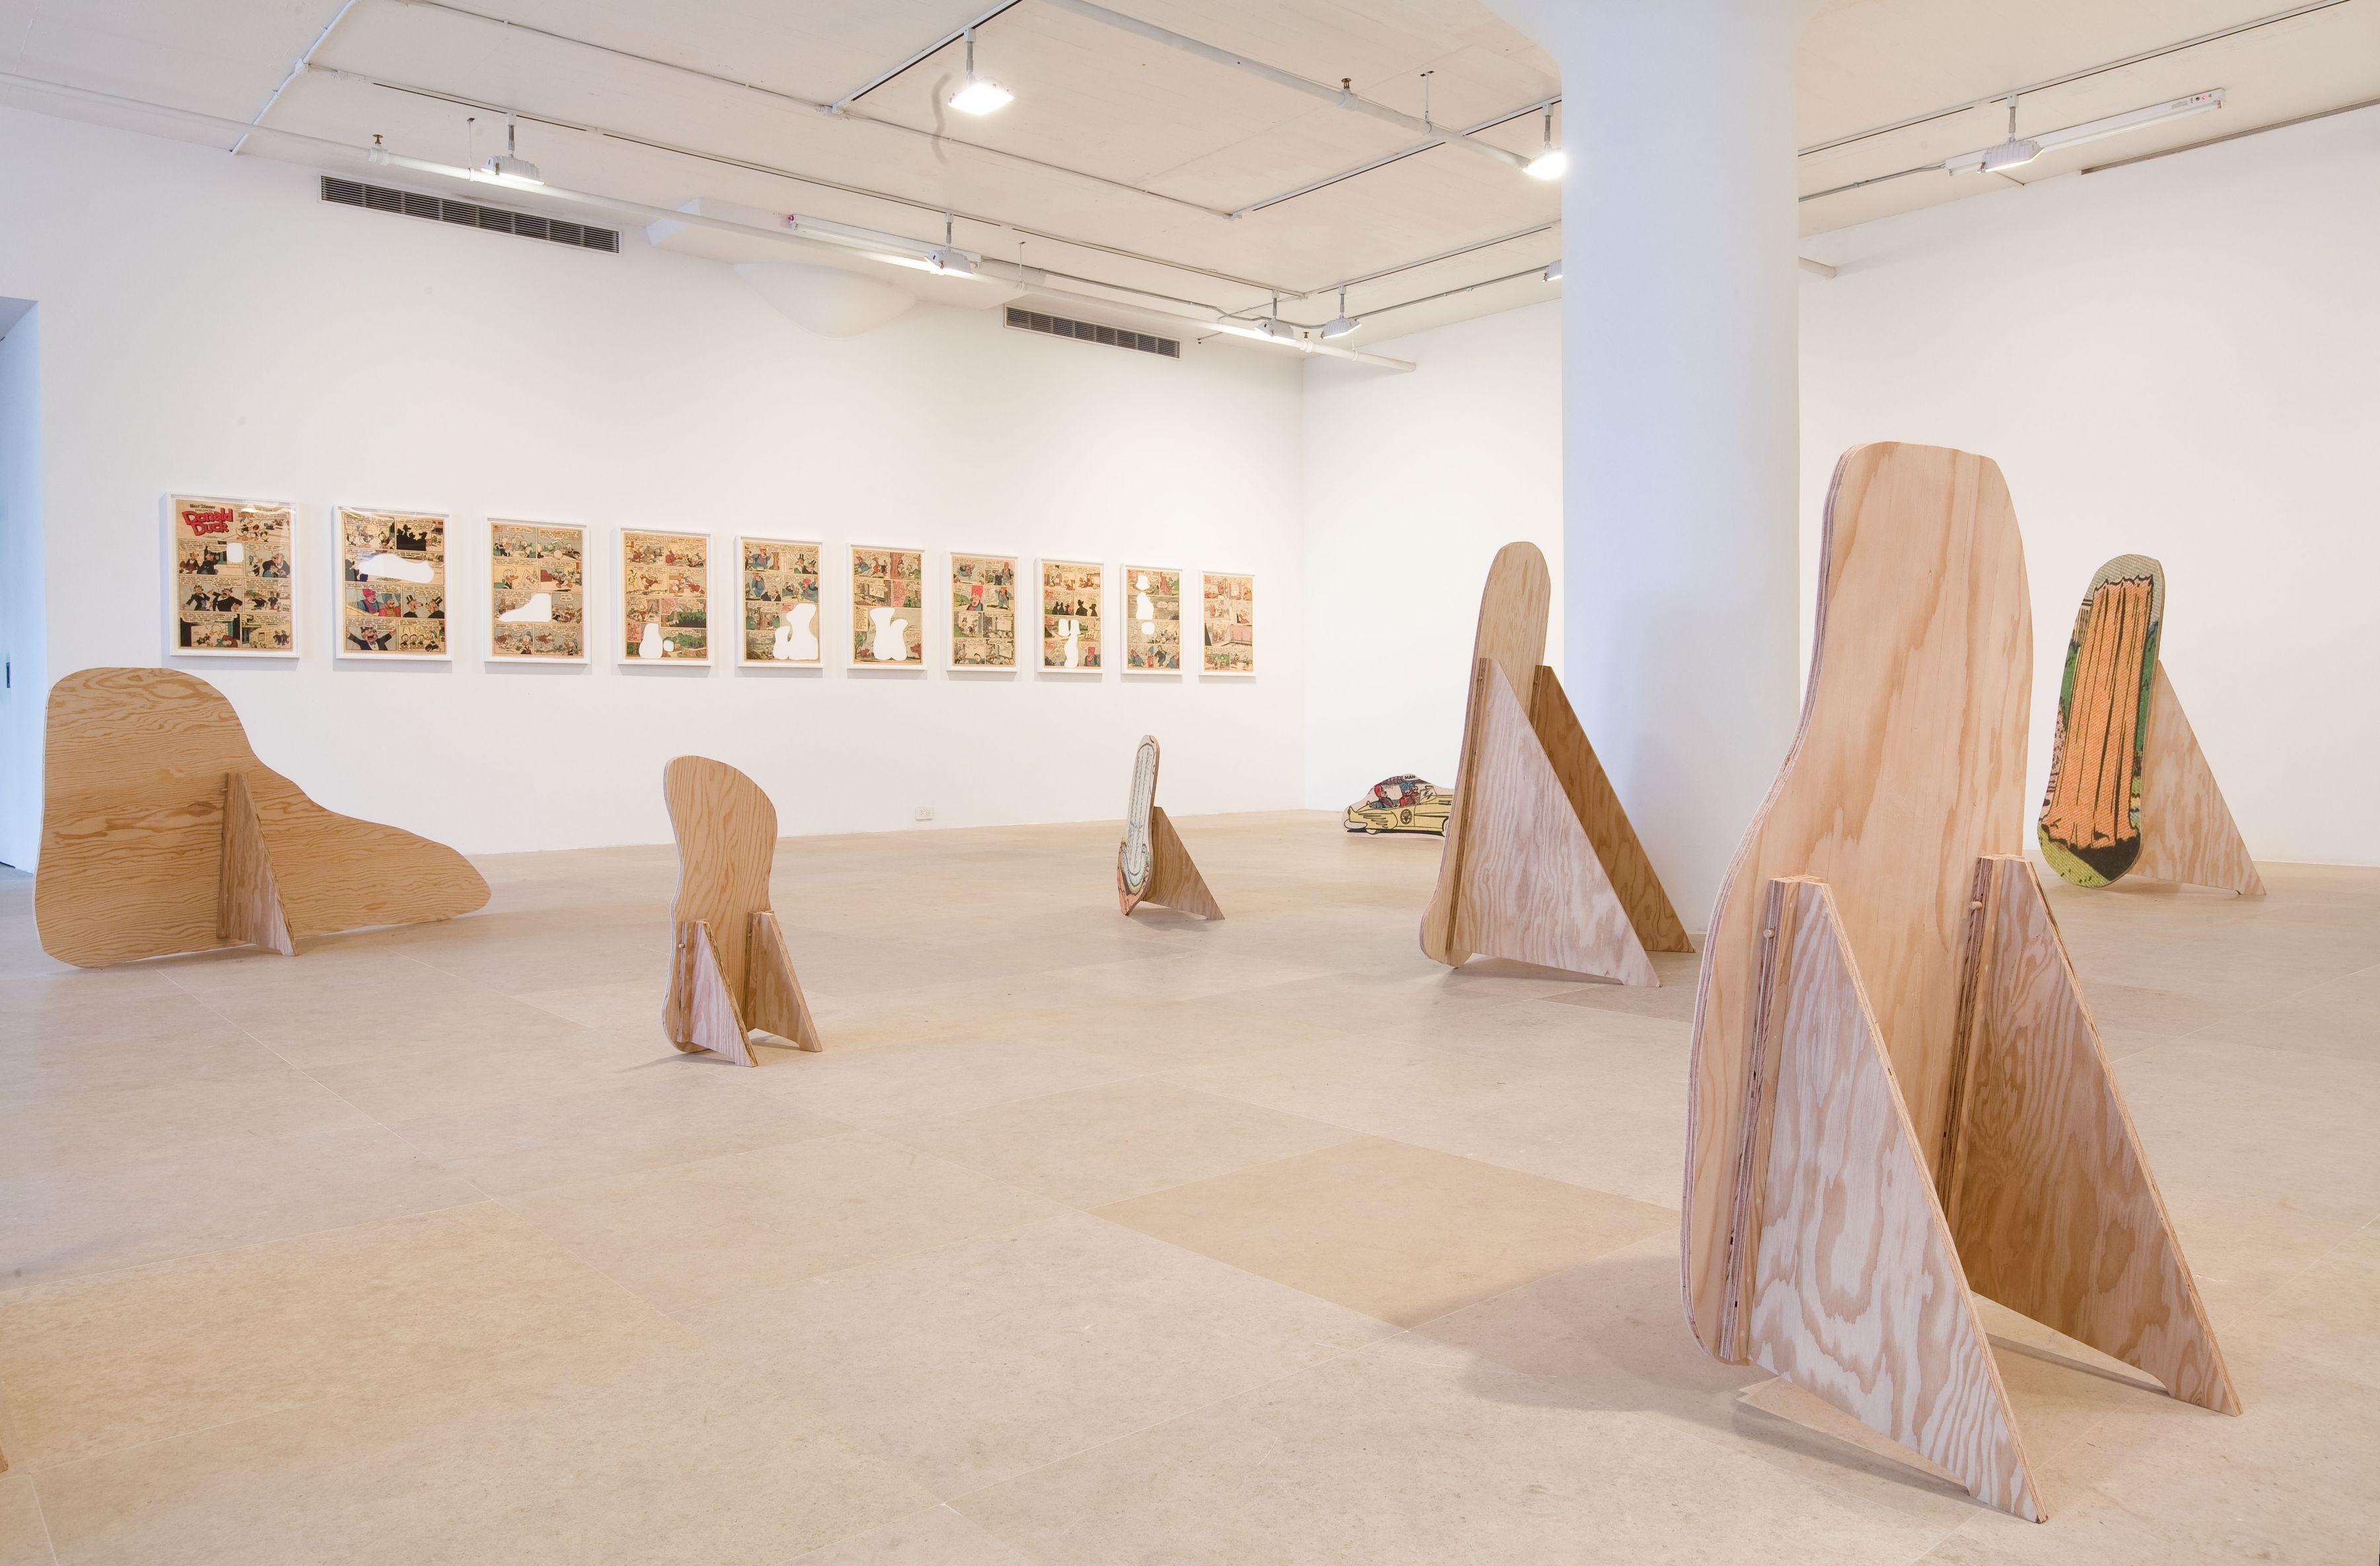 Allen Ruppersberg, Installation view, Greene Naftali, New York, 2010